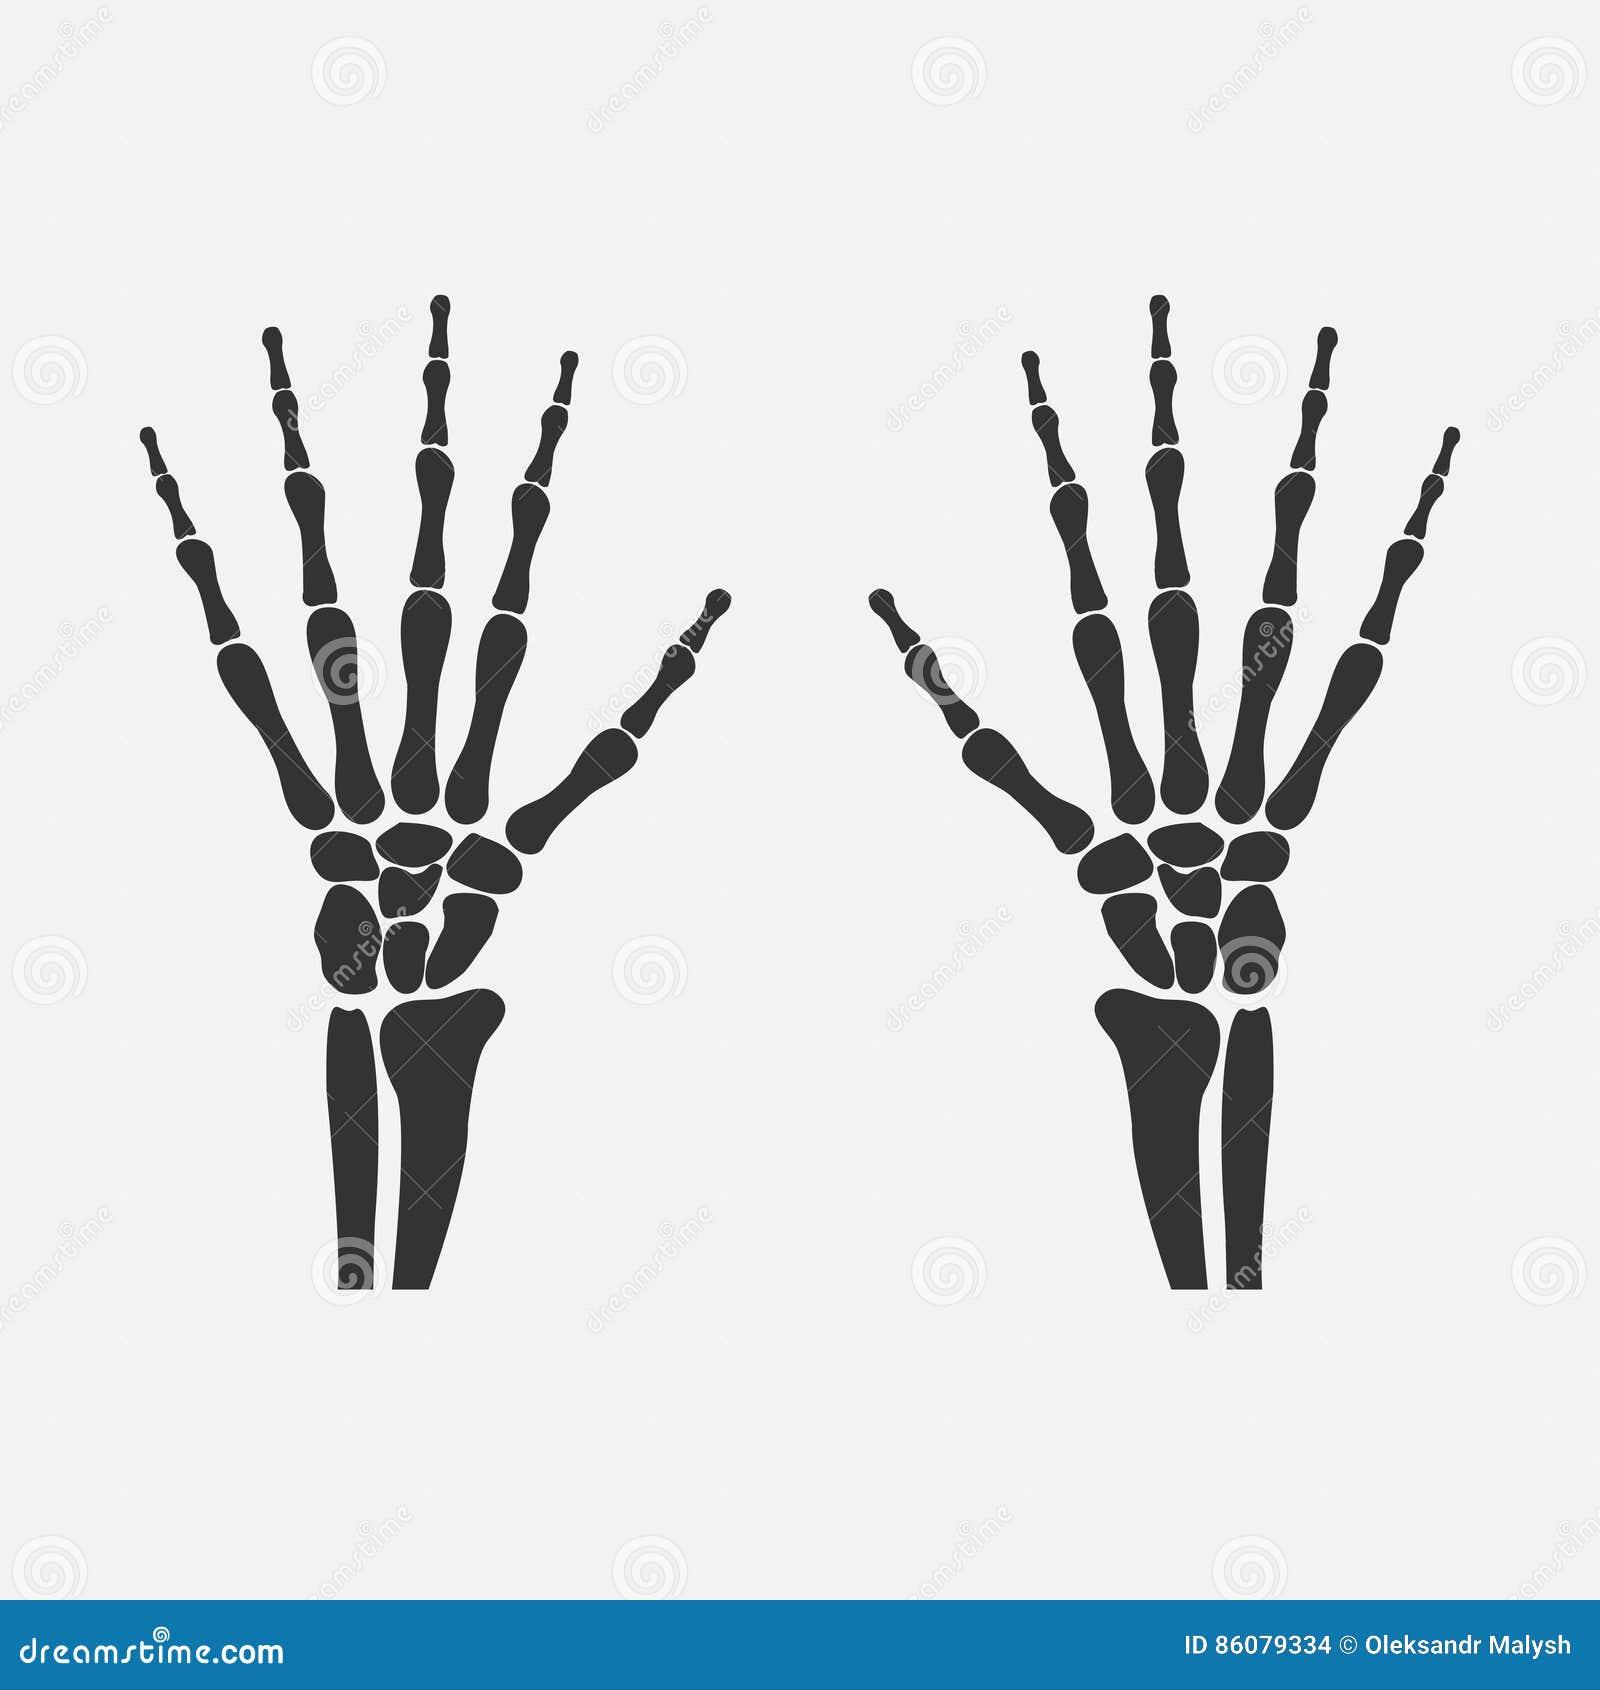 Wrist Hands Bones Stock Vector Illustration Of Anatomy 86079334